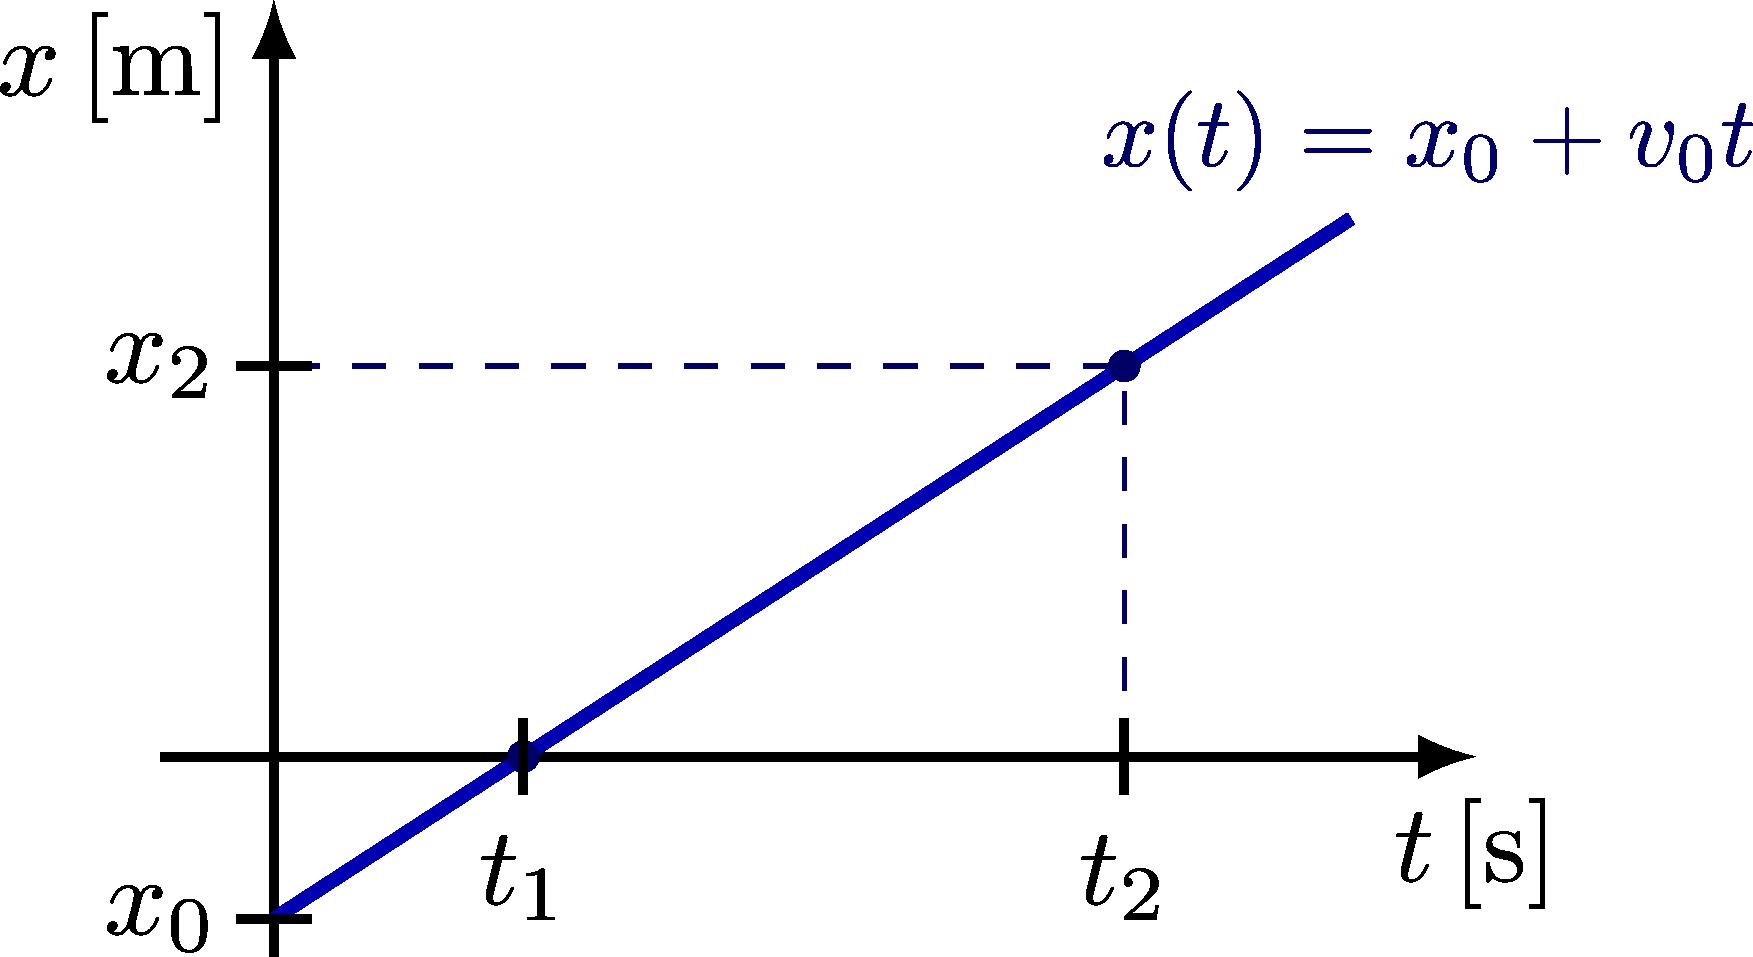 kinematics_curves-002.png